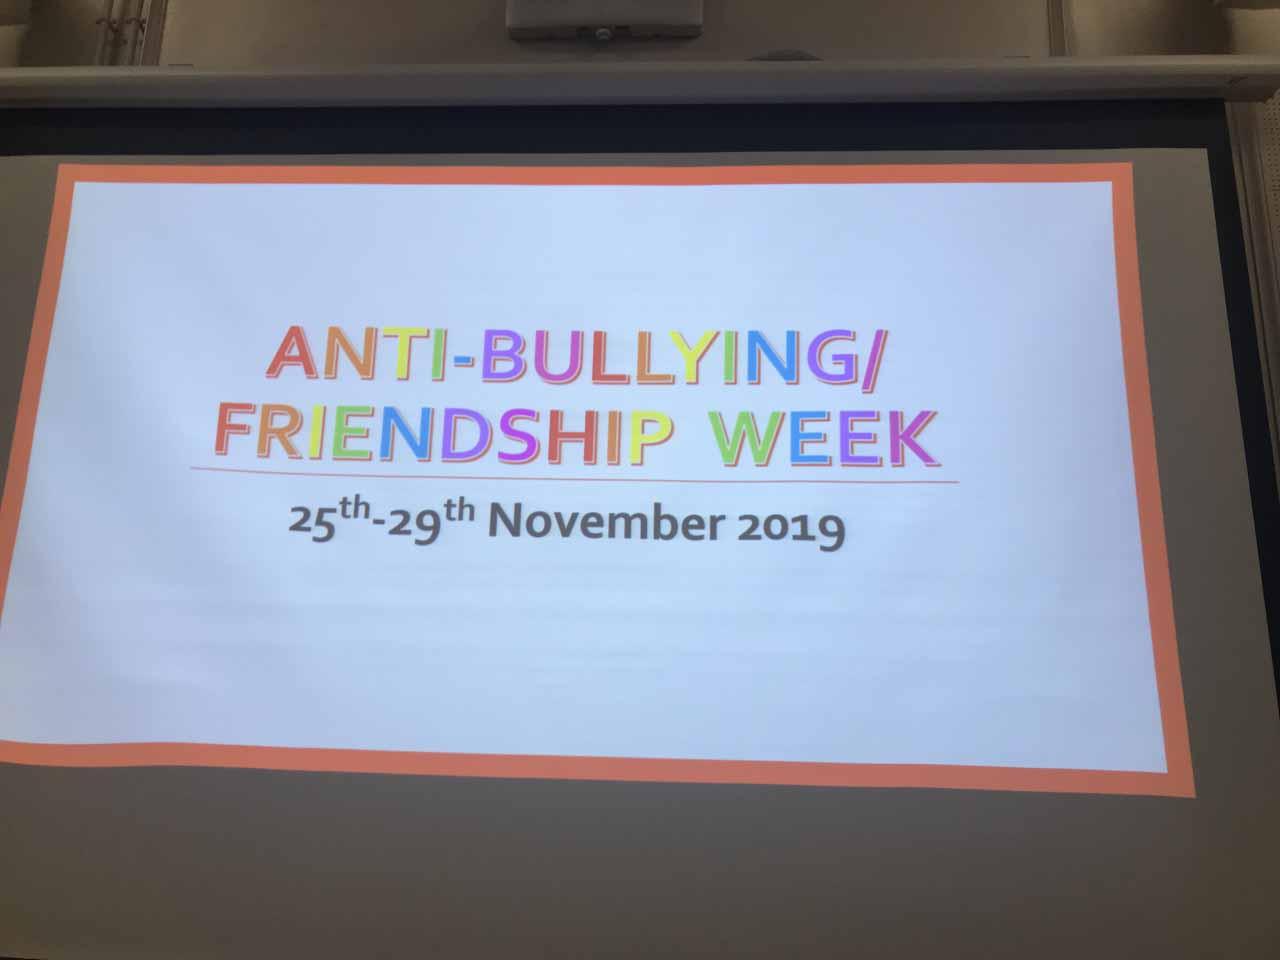 Anti-Bullying/Friendship Week